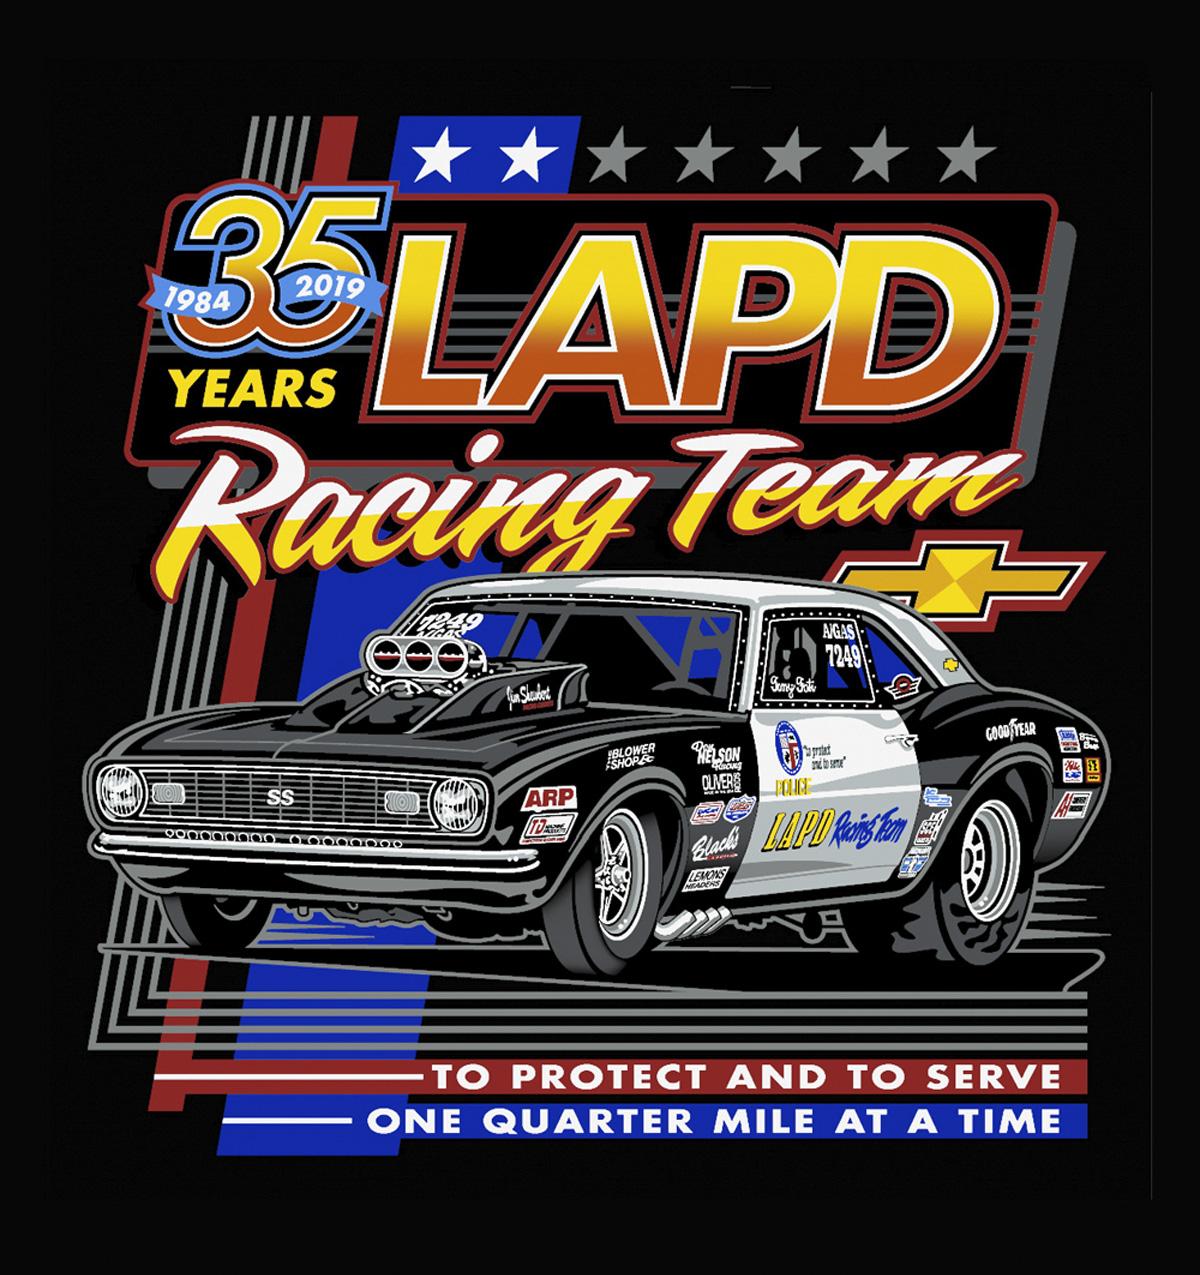 LAPD-Racing-Zoomies-4x4-25